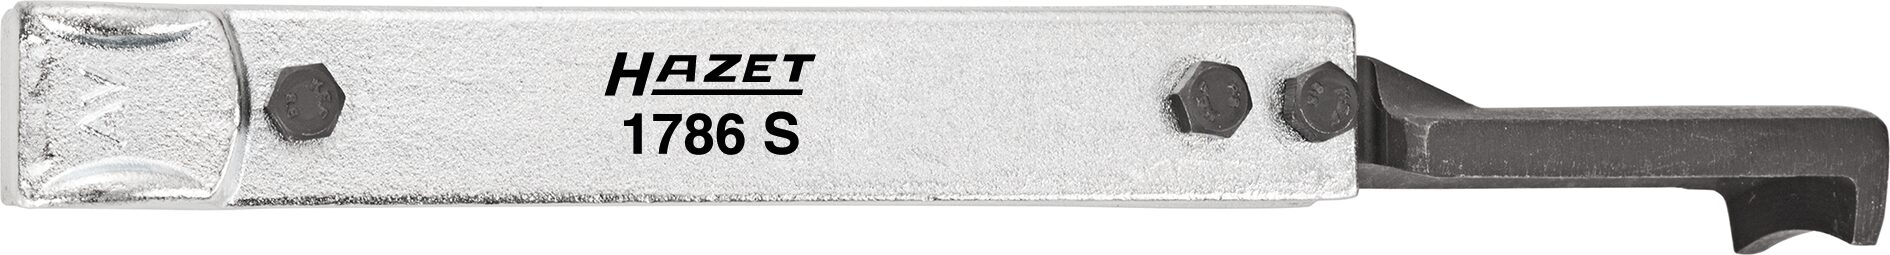 HAZET Abzughaken ∙ 200mm 1786S-200